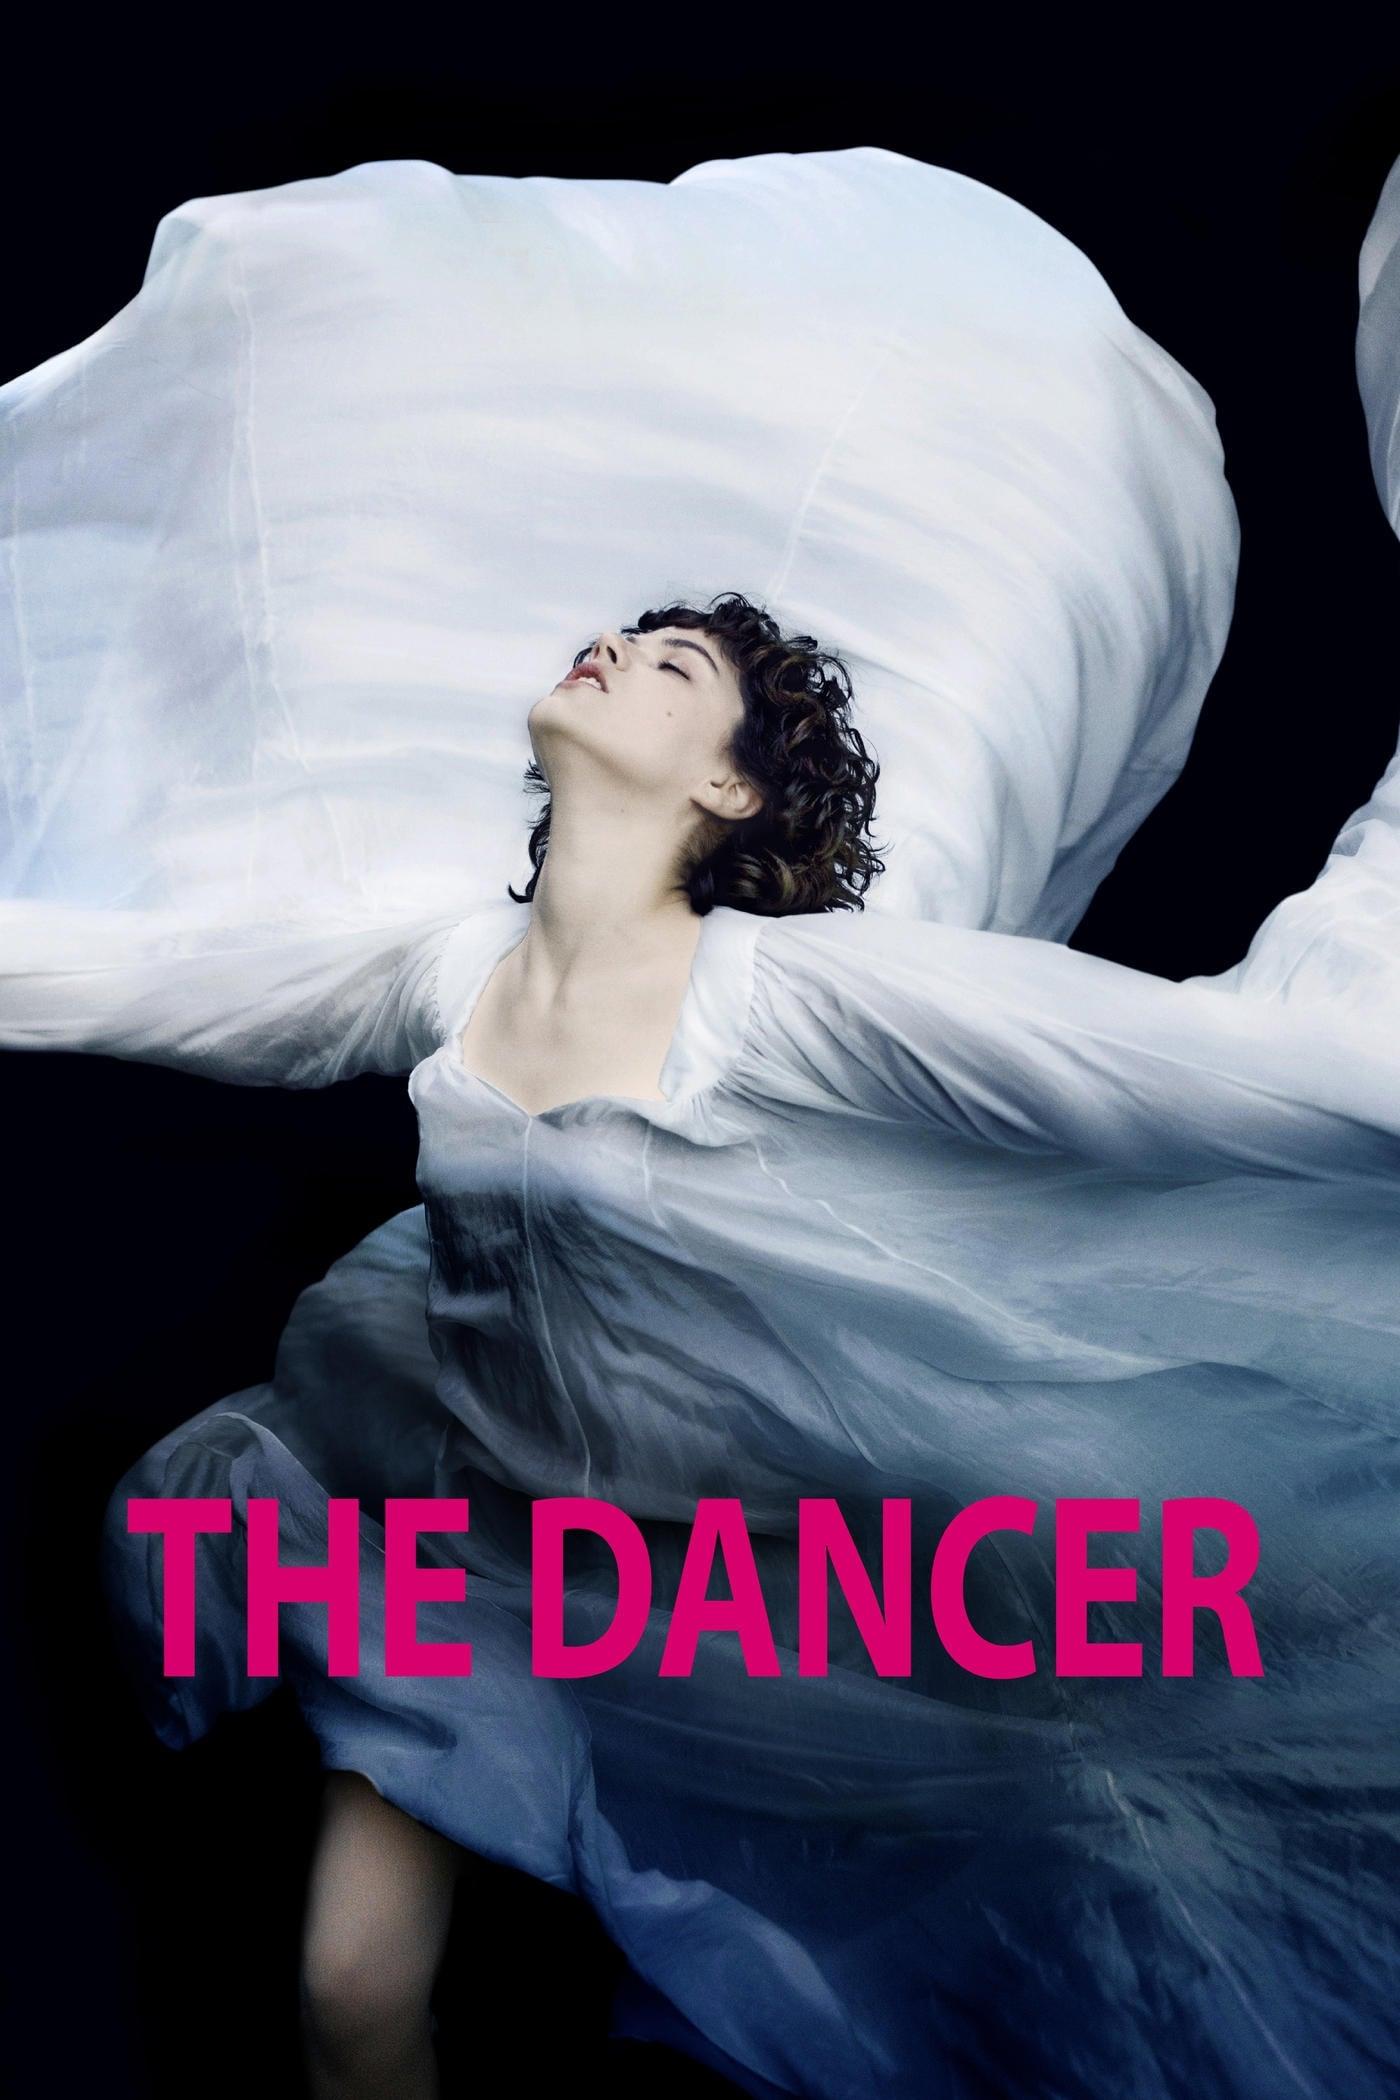 La bailarina (The Dancer)